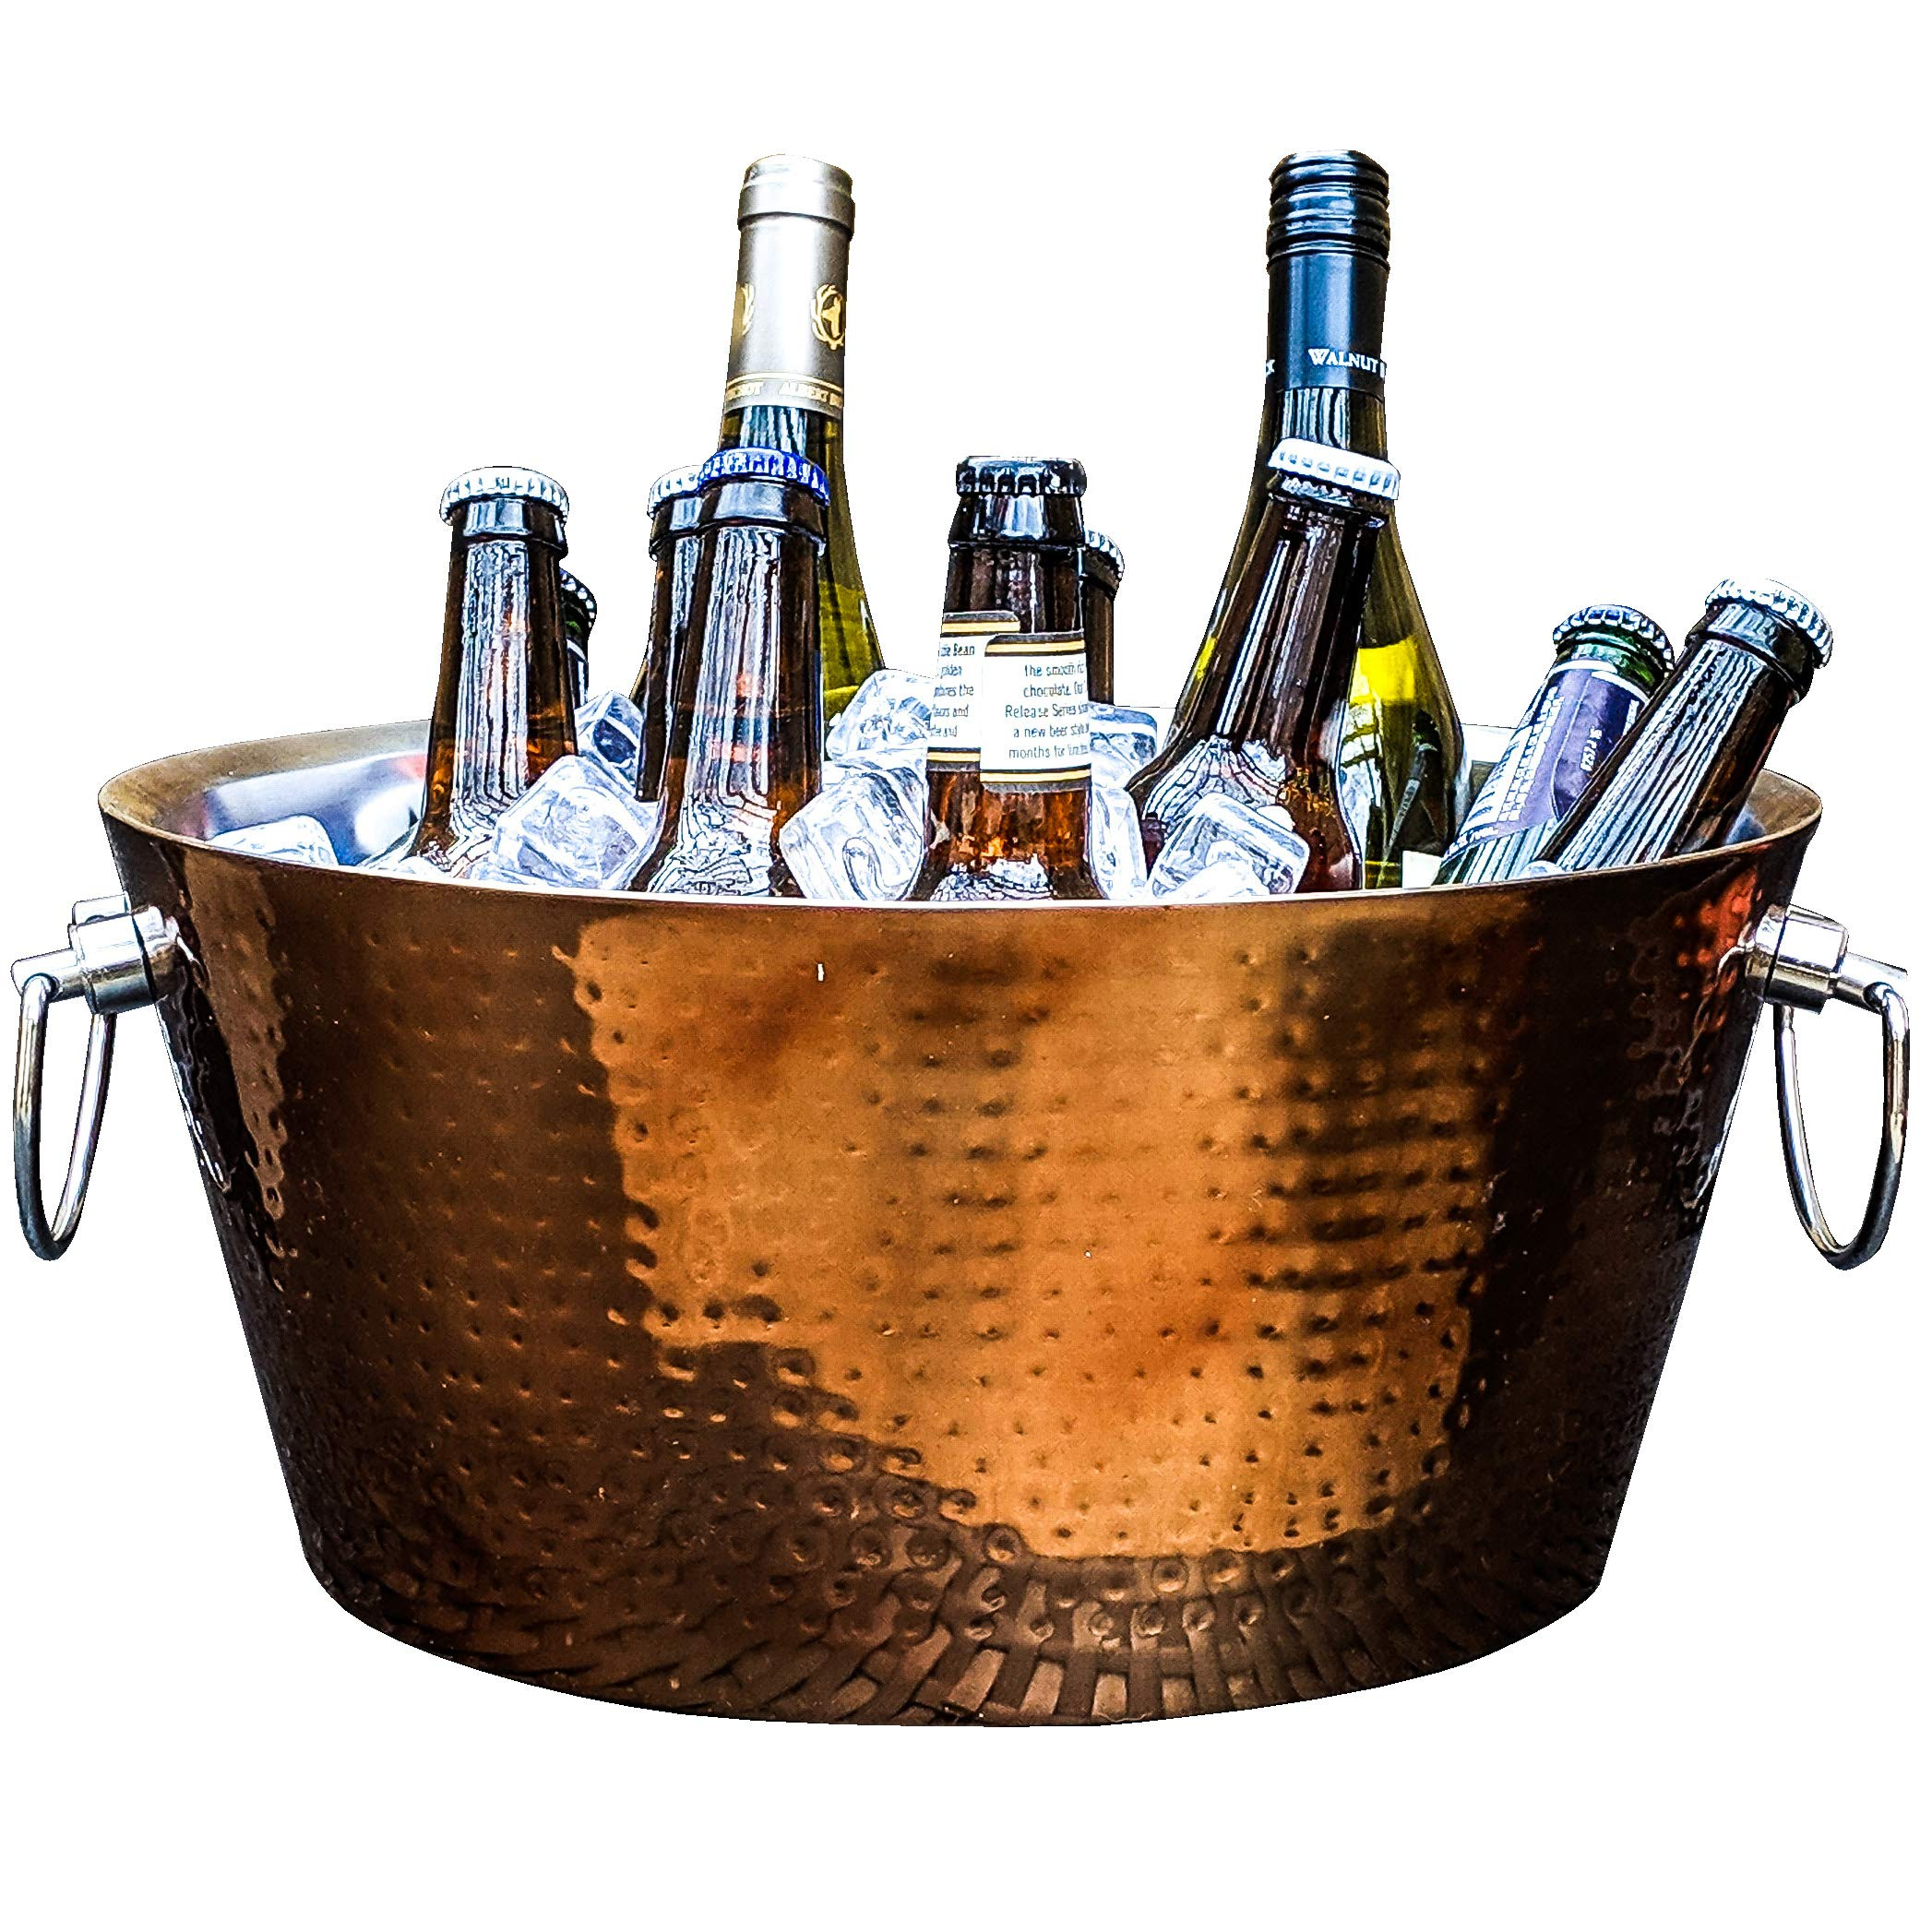 BREKX Hammered Rose Gold Stainless Steel Beverage Tub - Extended Insulation - 17 Quarts by BREKX